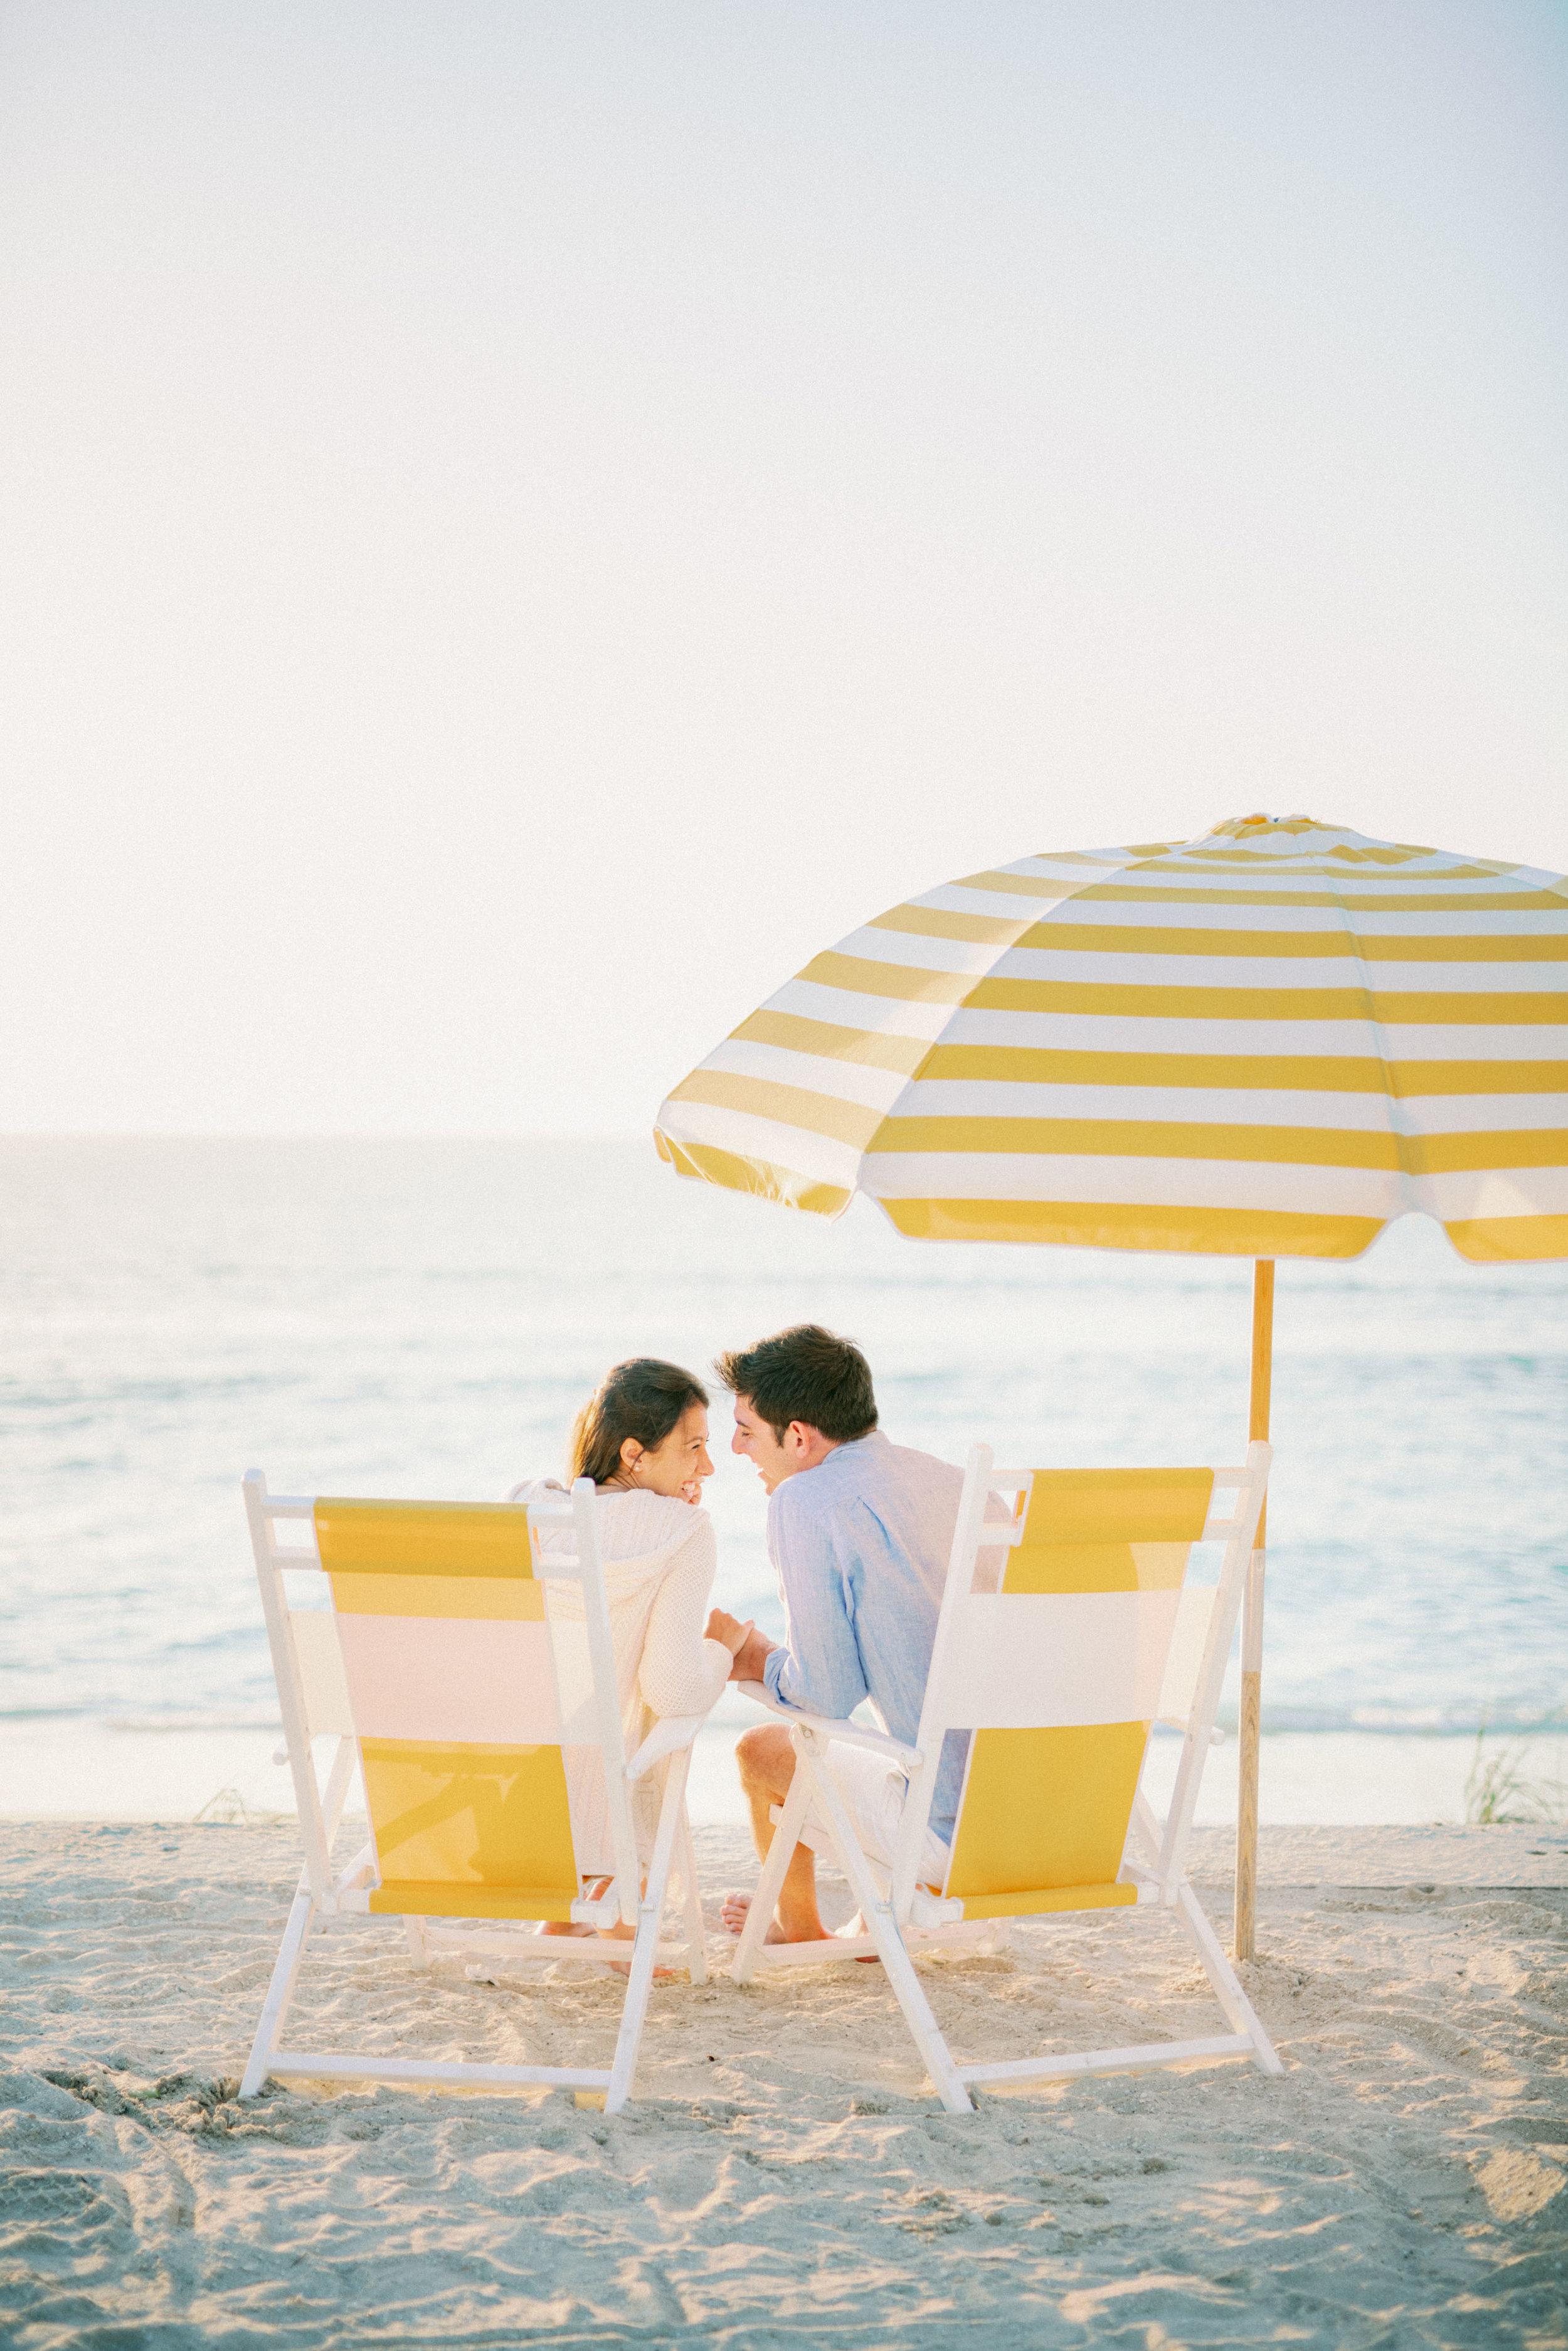 gasparilla island boca grande cute yellow umbrella beach engagem